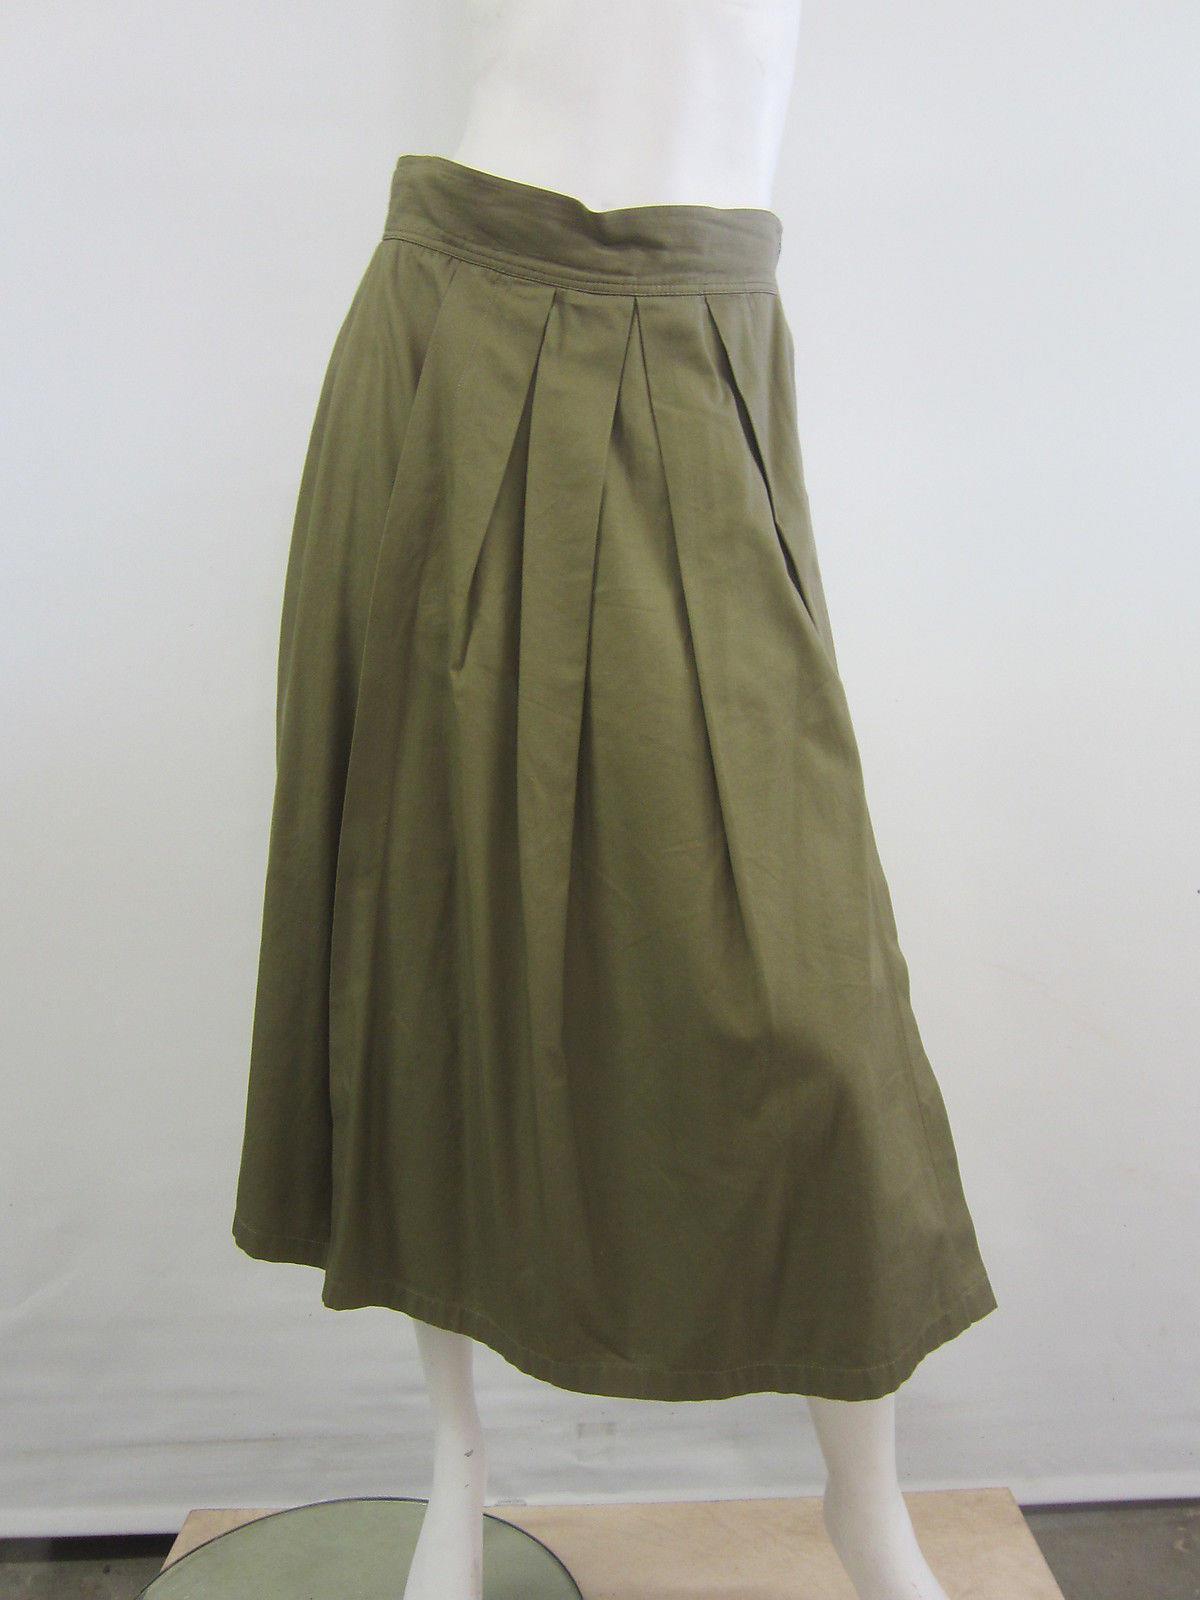 louis feraud s semi pleated skirt khaki 12 42 ebay